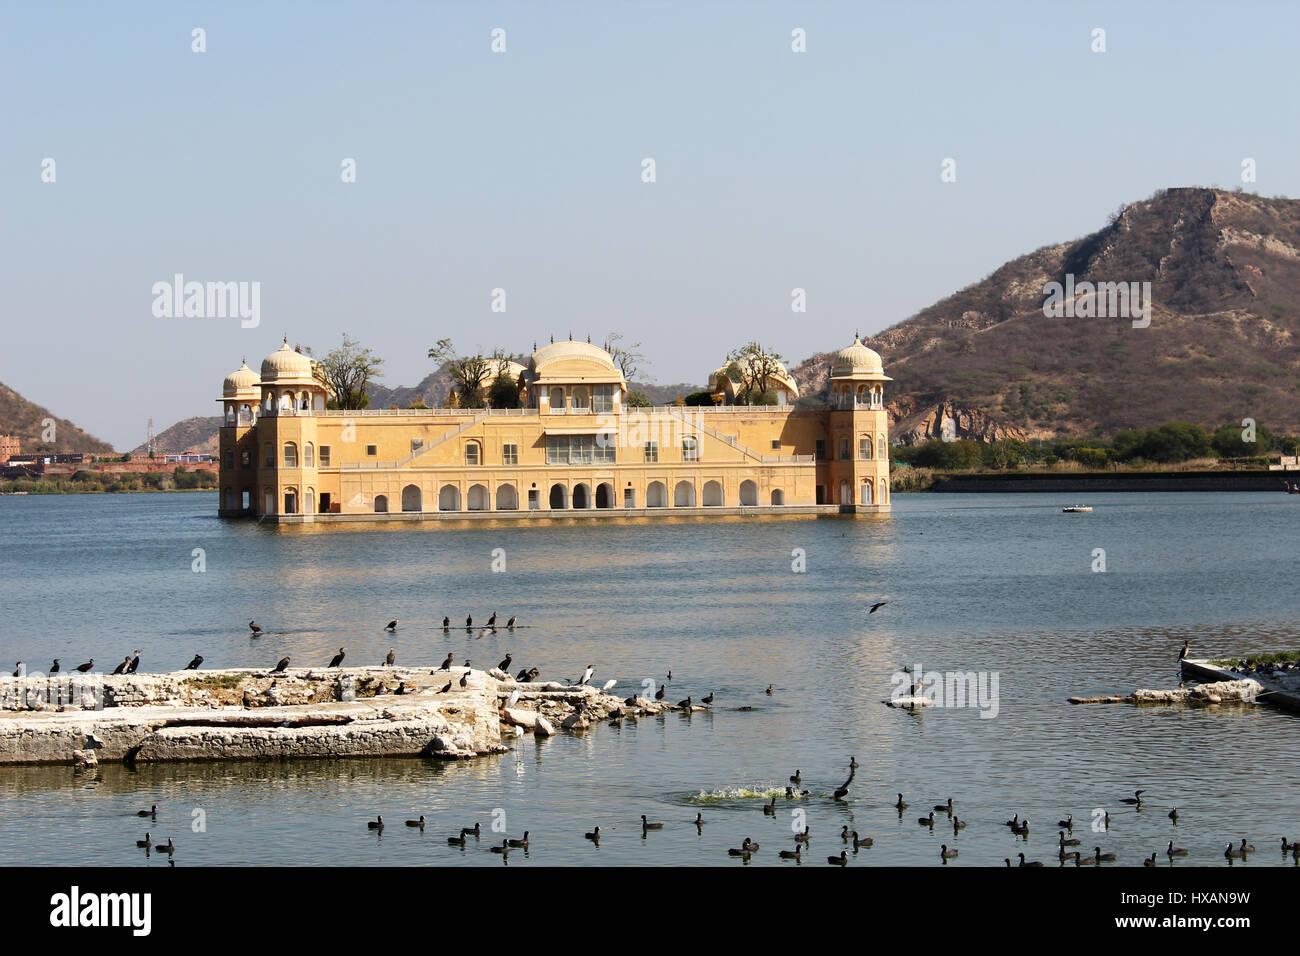 Jai Singh's Jal Mahal ,ManSagar lake, Jaipure, Rajastan, India. - Stock Image